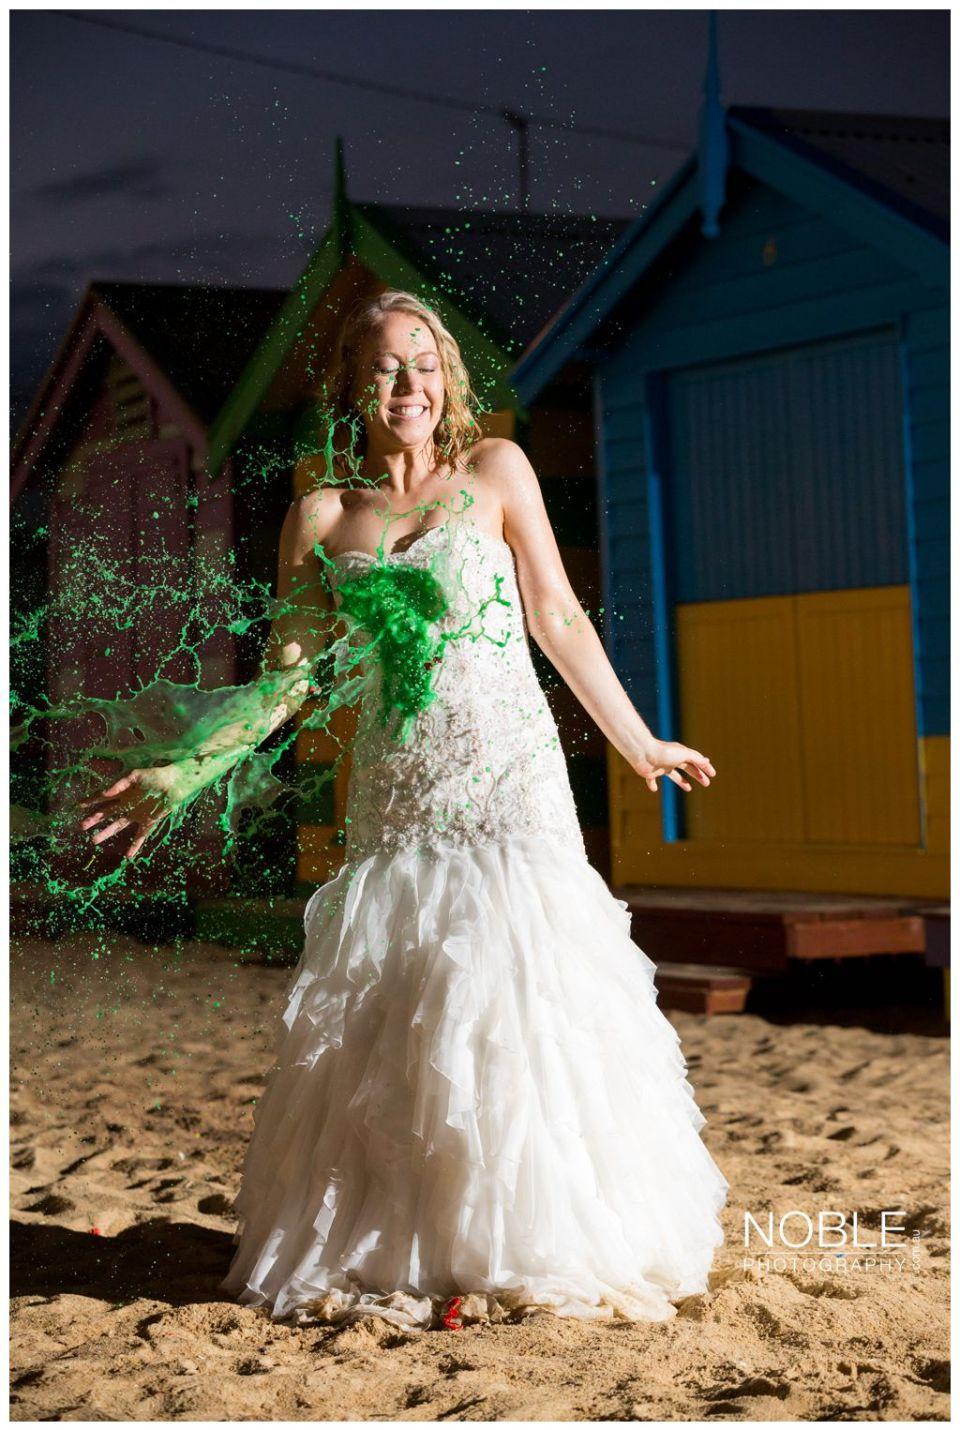 Paint on wedding dress